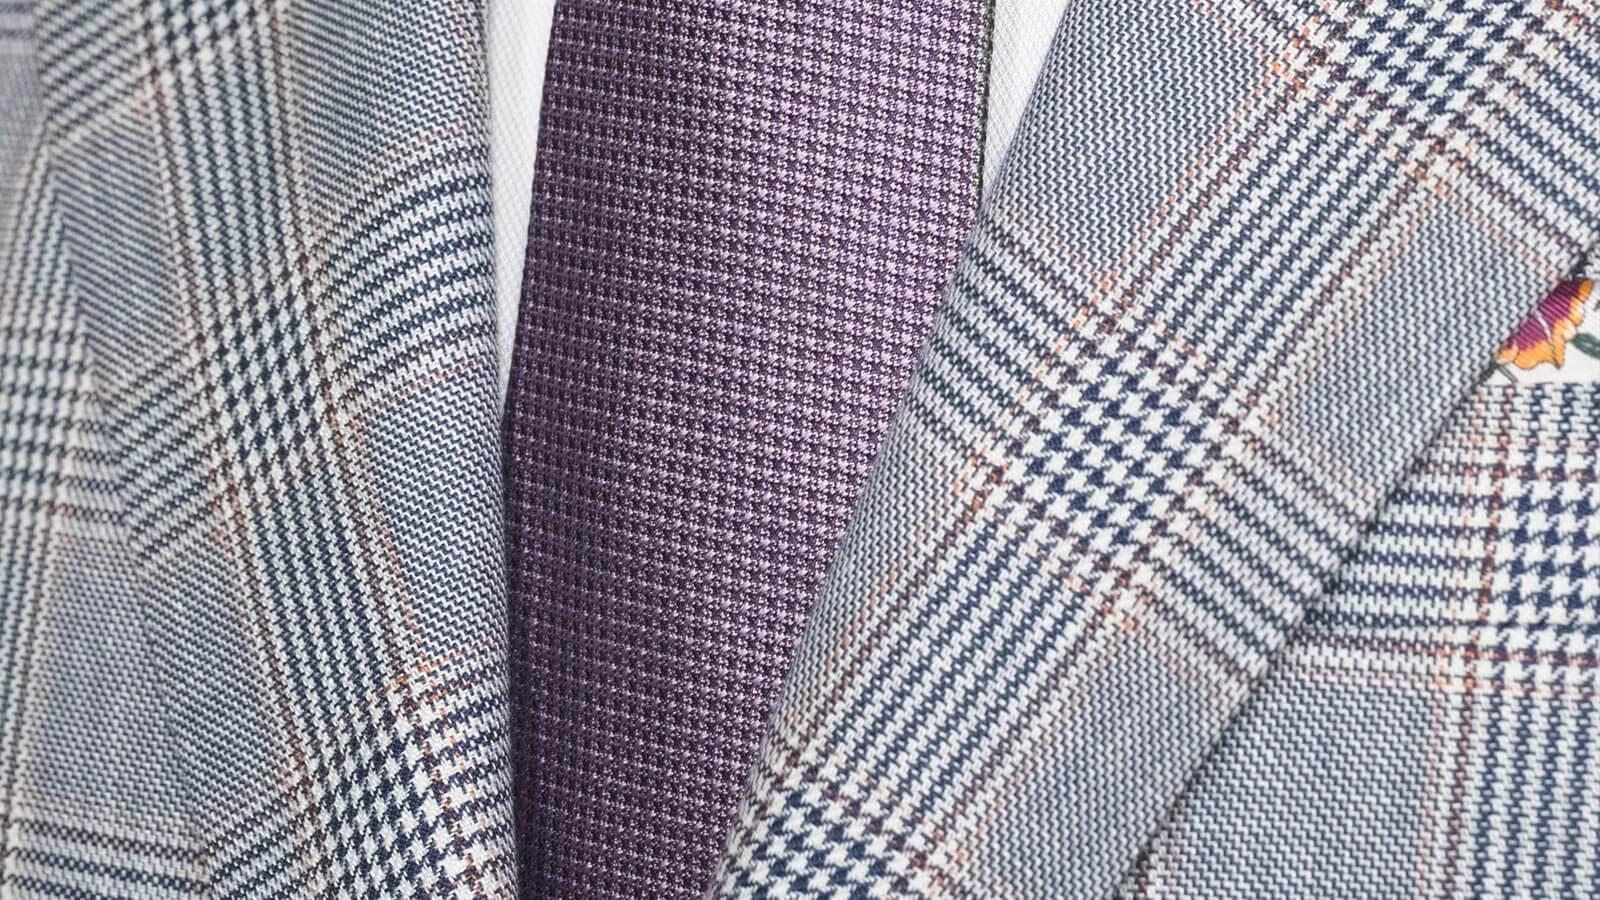 Light Blue Plaid Linen-Cotton Blazer - slider image 1